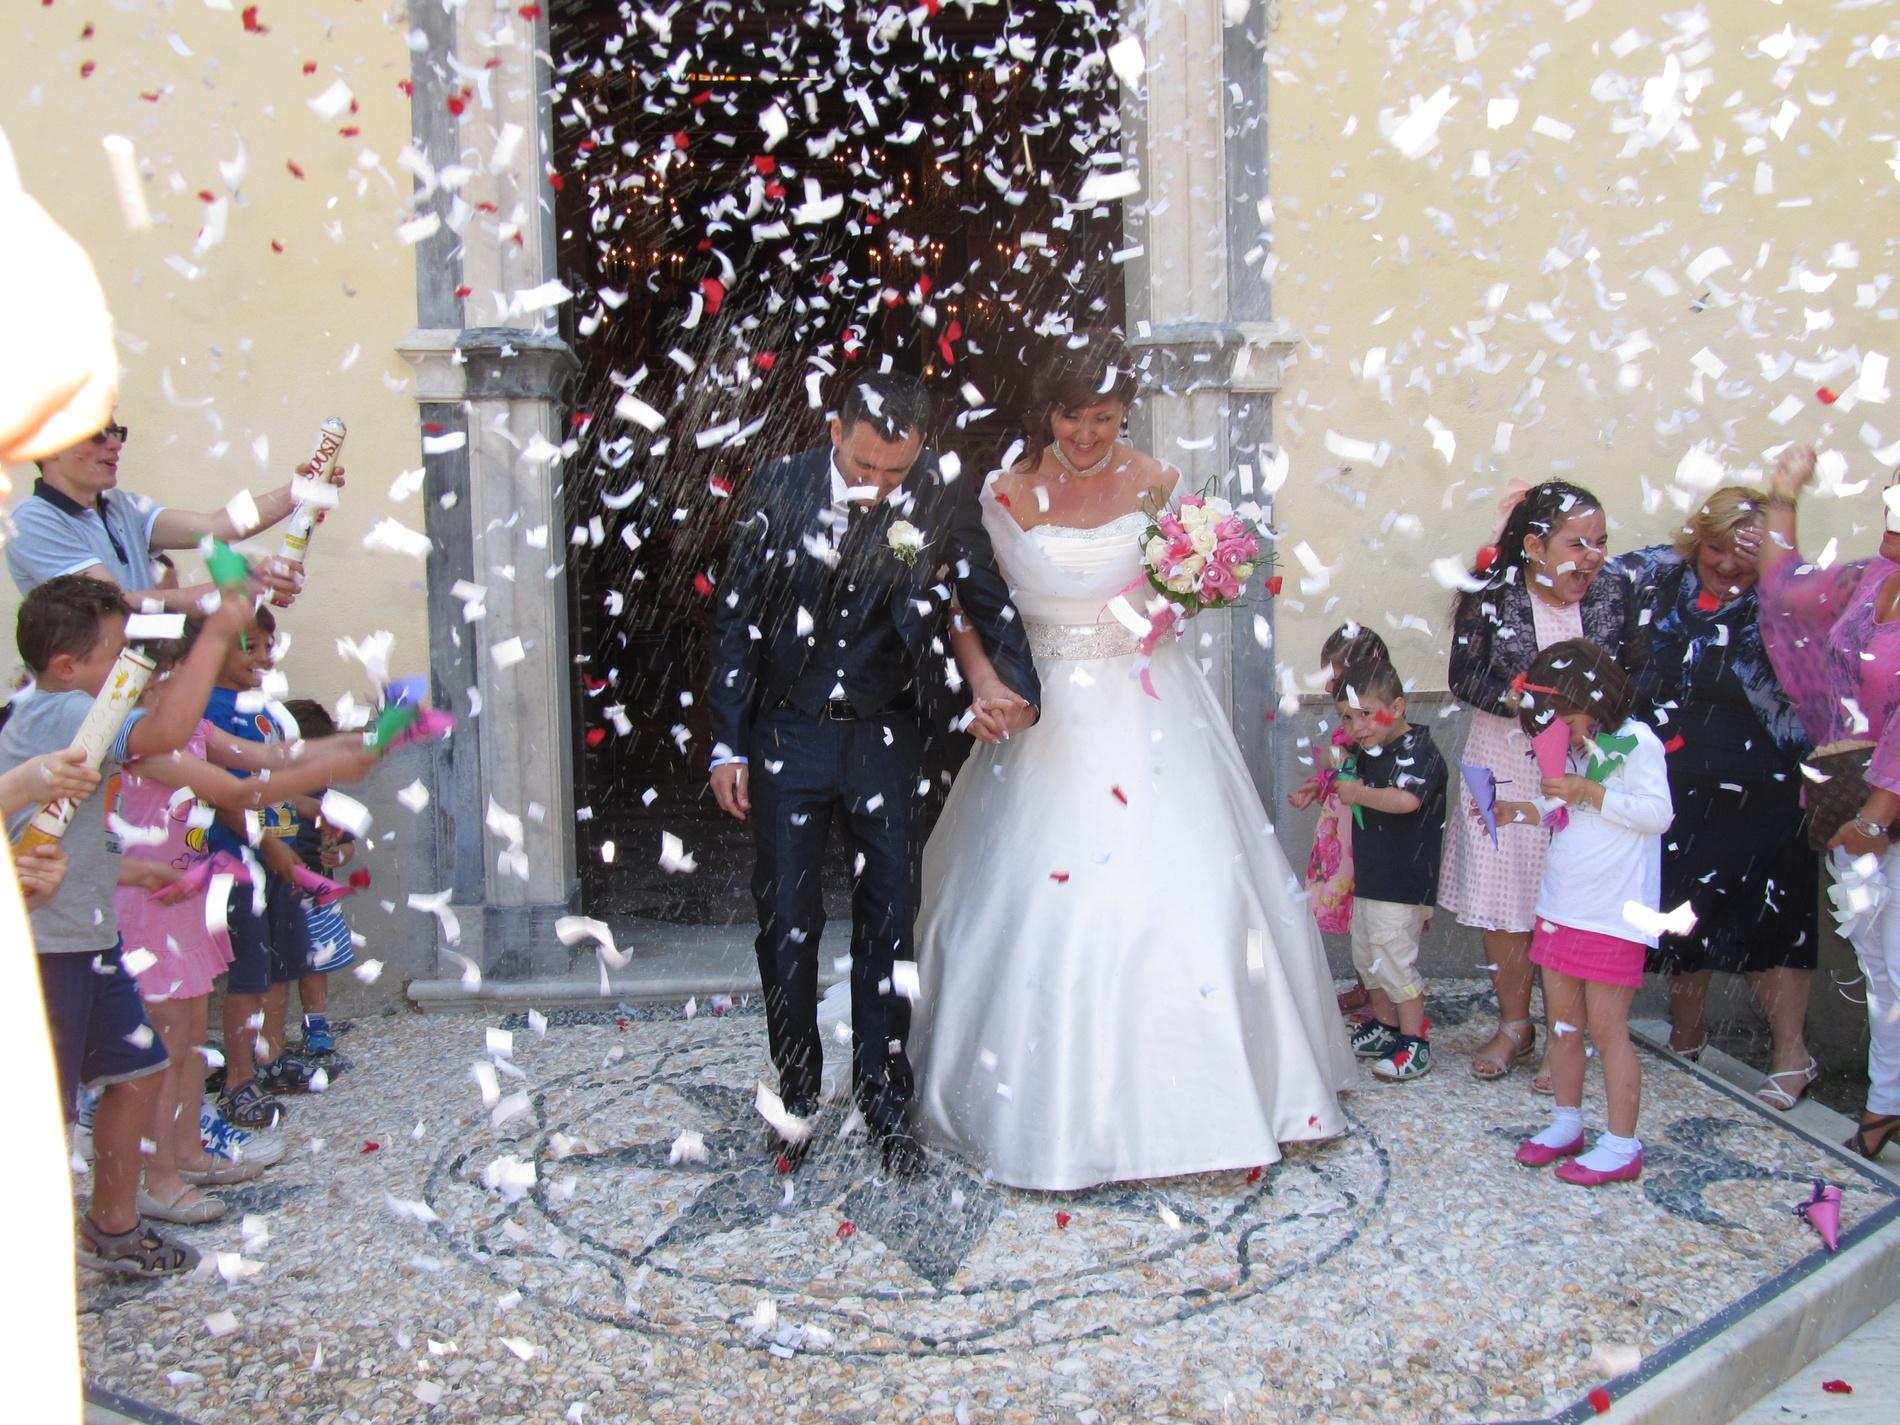 matrimonio-vicari-scino-2015-06-20-11-47-37